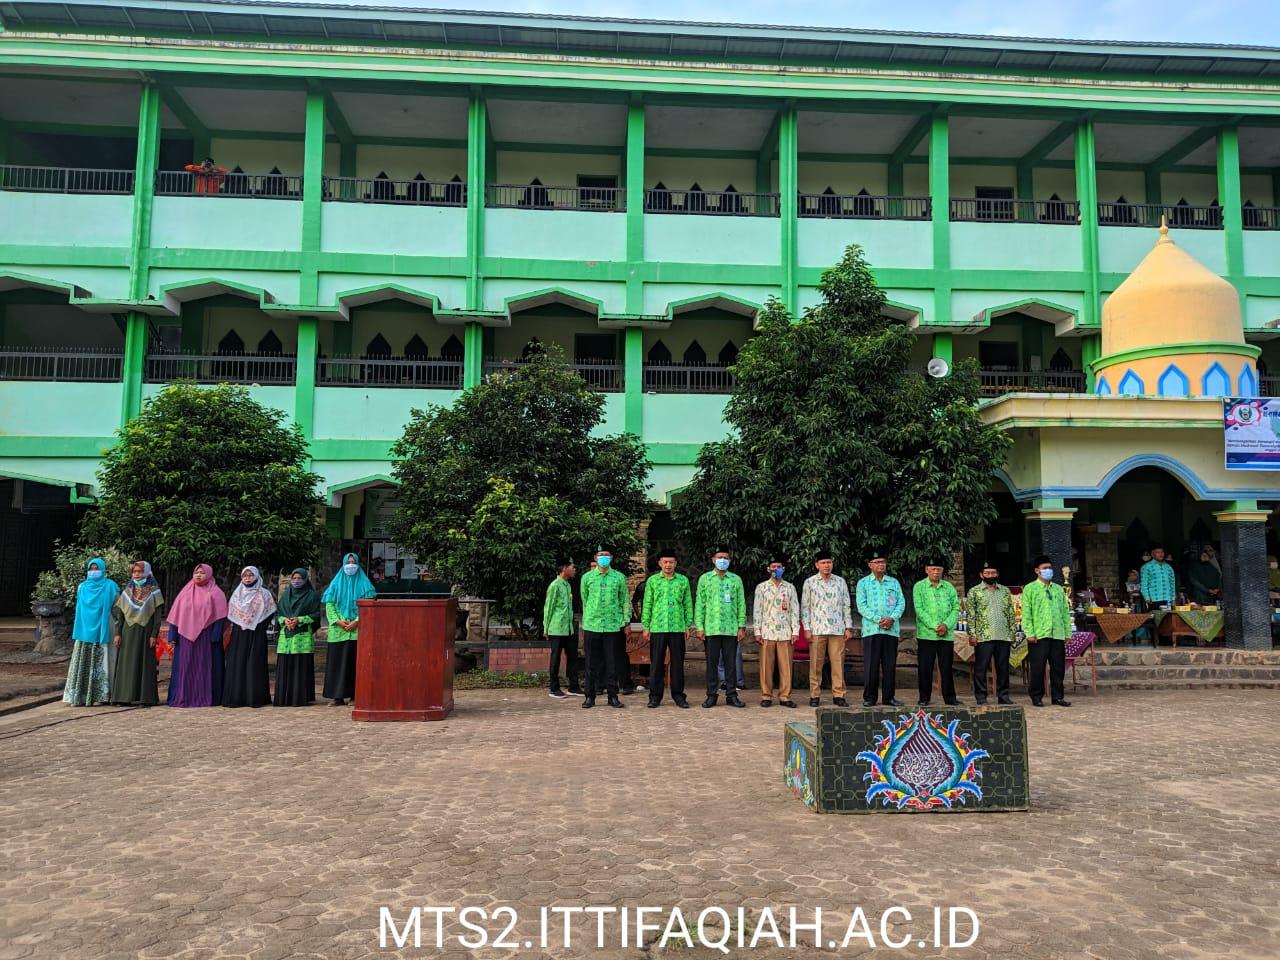 OPENING AL-ITTIFAQIAH KNOWLEDGE CHAMPION (IKC) DAN RANGKING 1